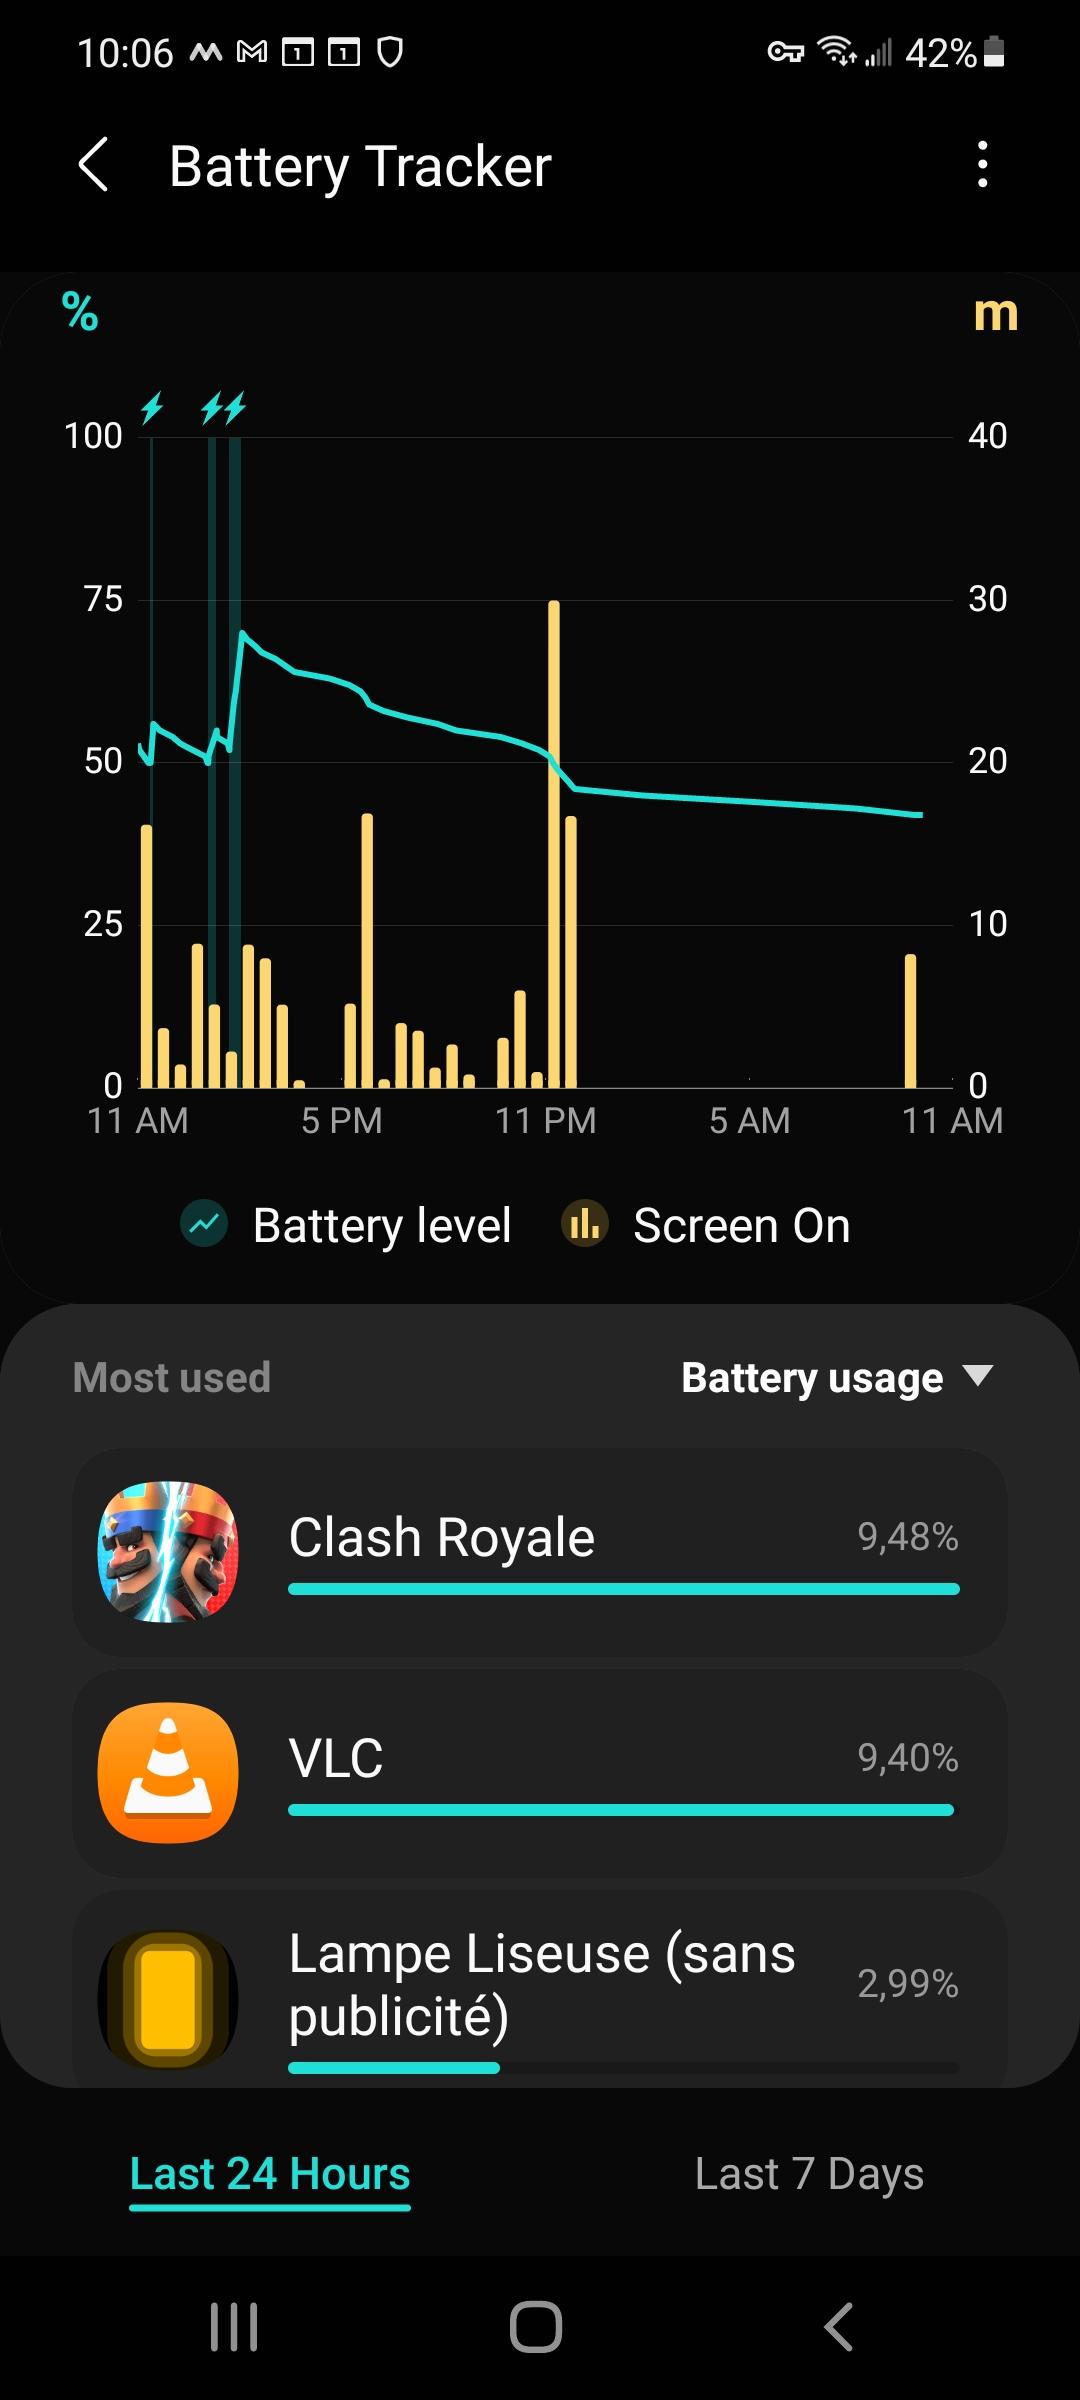 Screenshot_20210228-100651_Battery Tracker.jpg